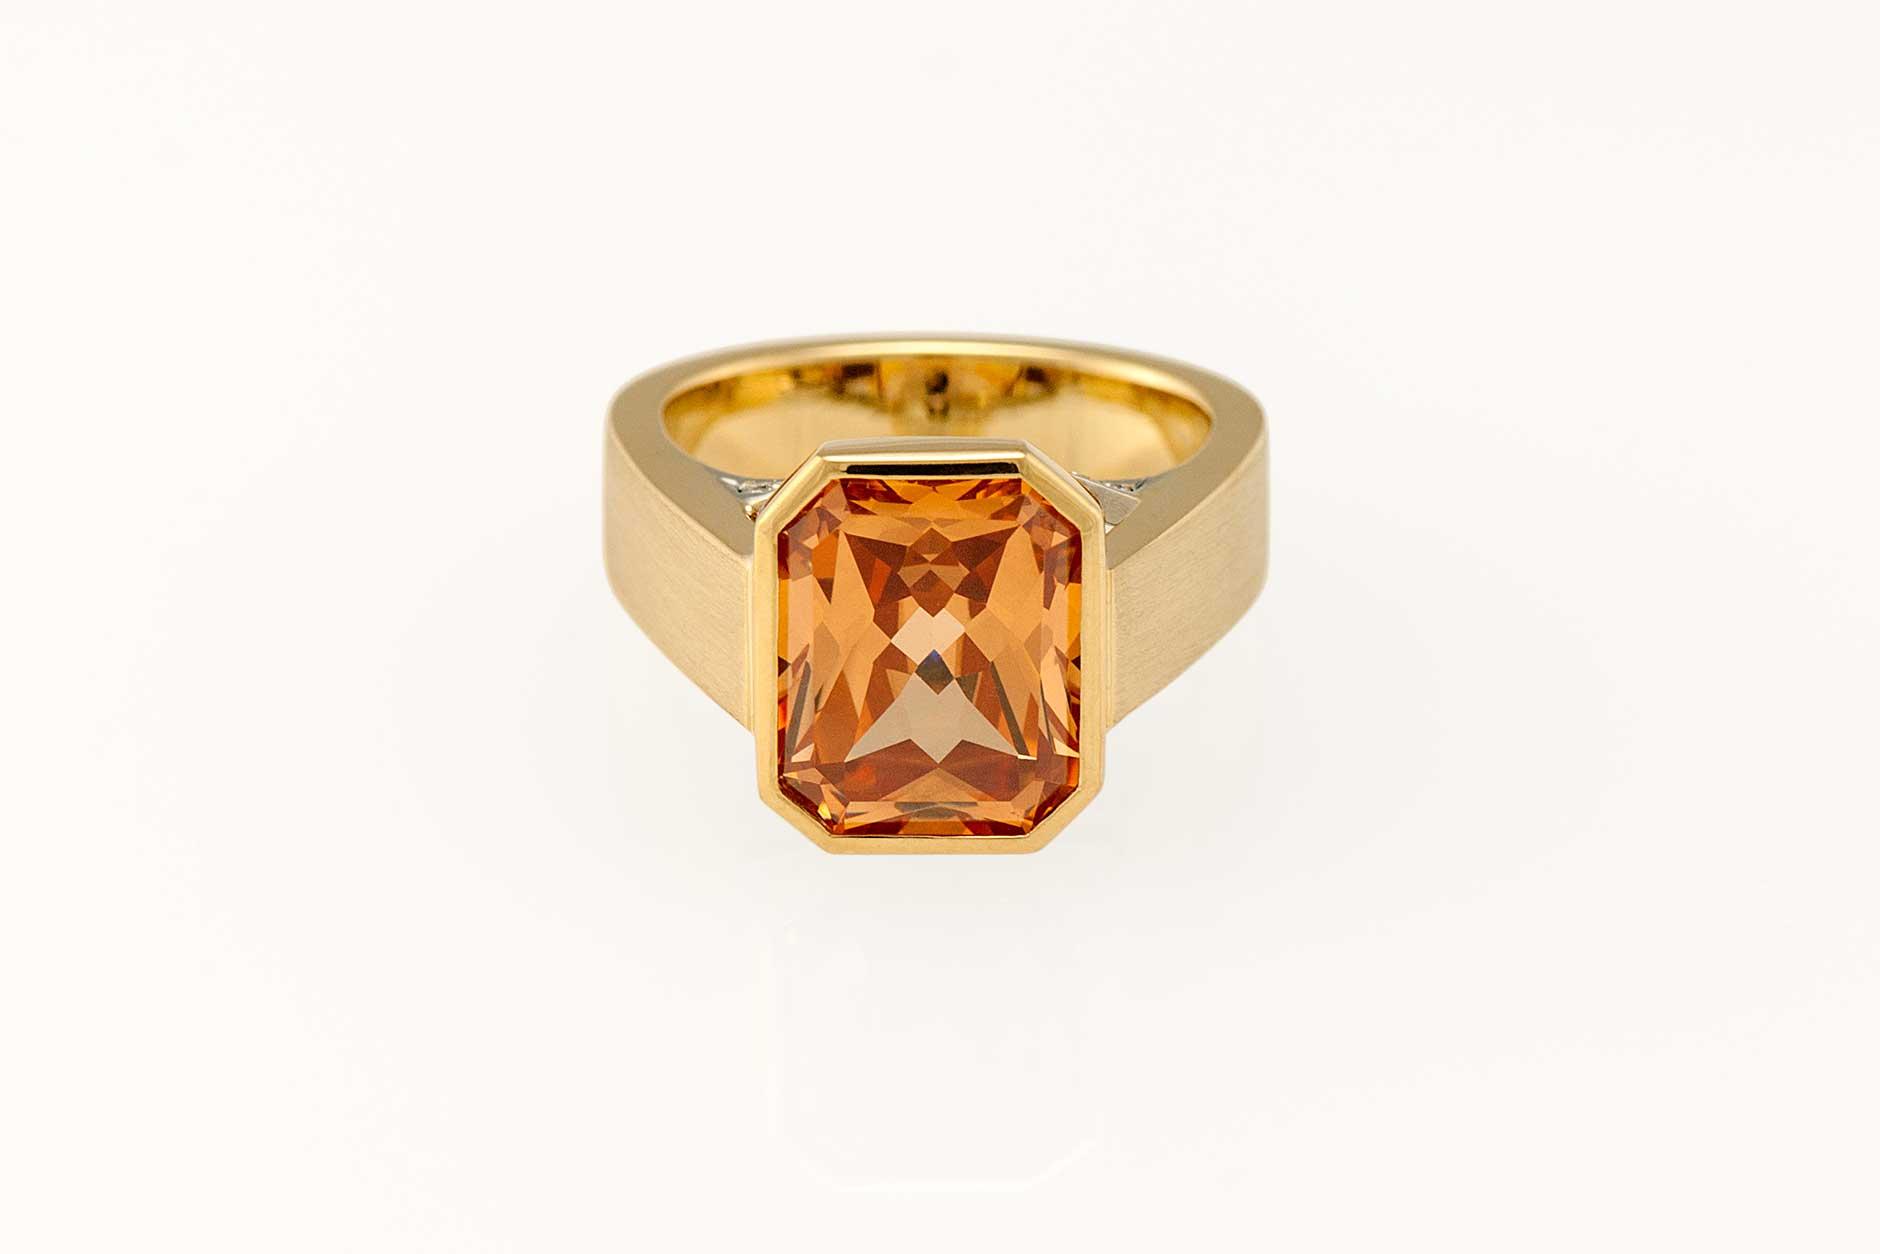 Custom 18k Yellow & 19k White Gold Two Tone Garnet Ring - NÉWA Goldsmith